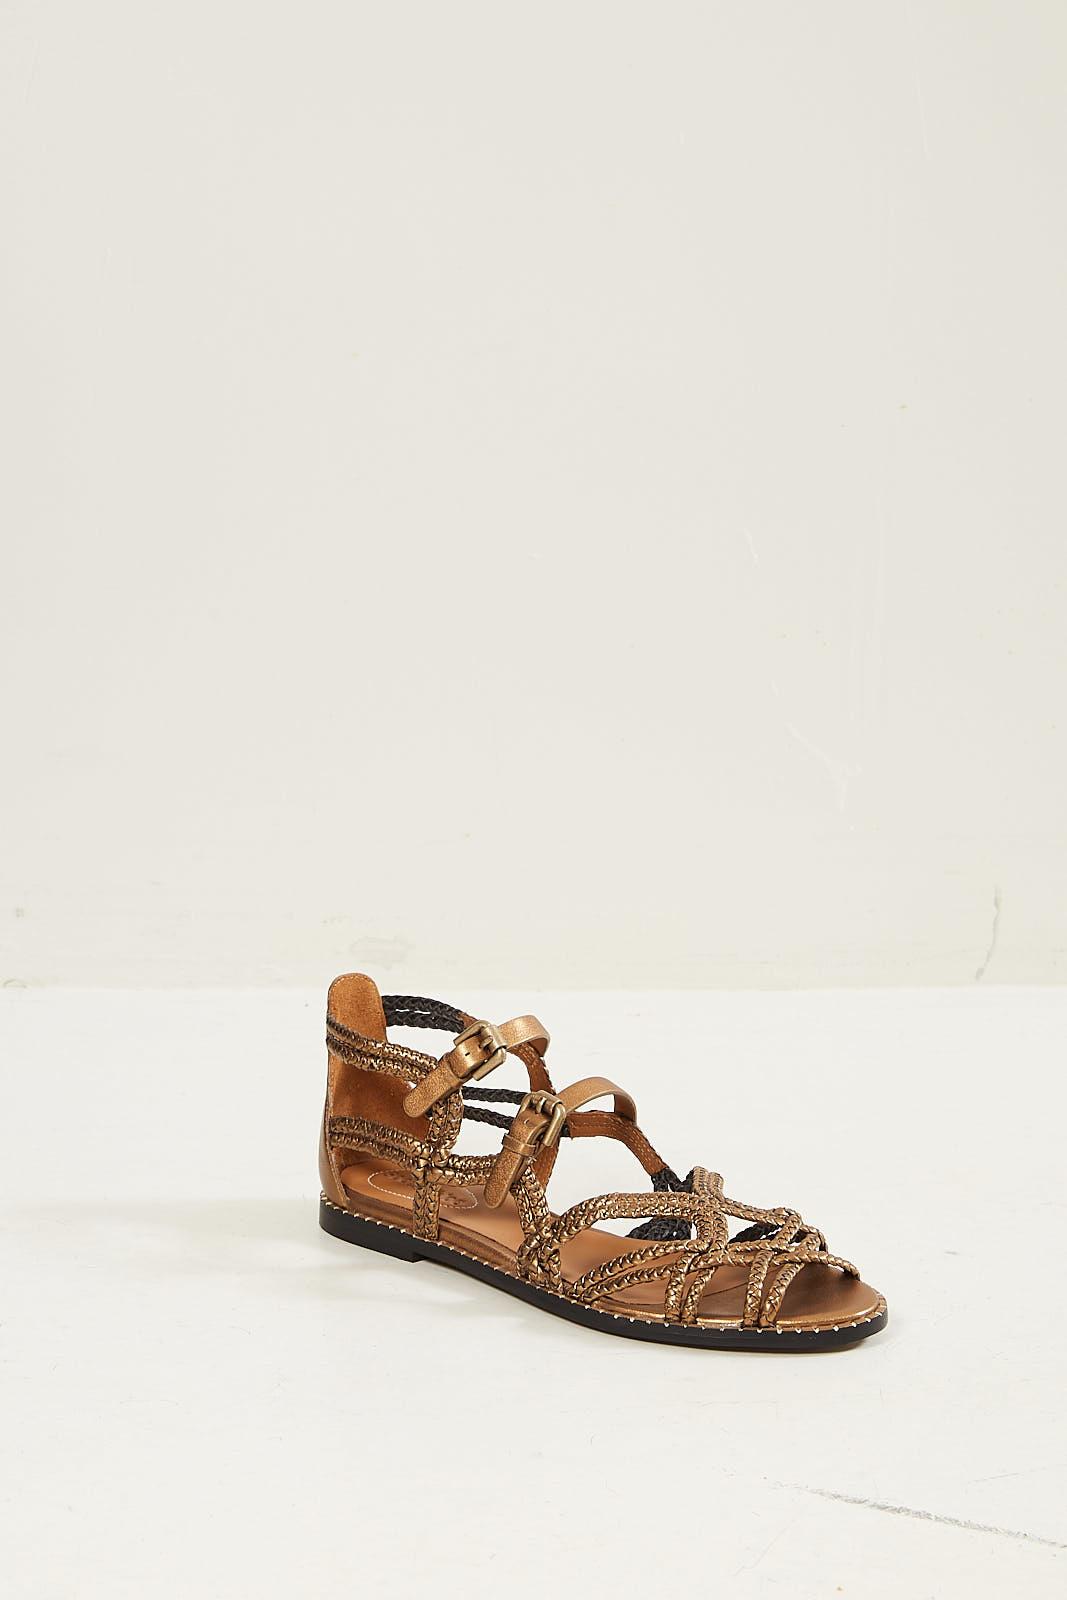 - Vigor lame vintage nappa sandals